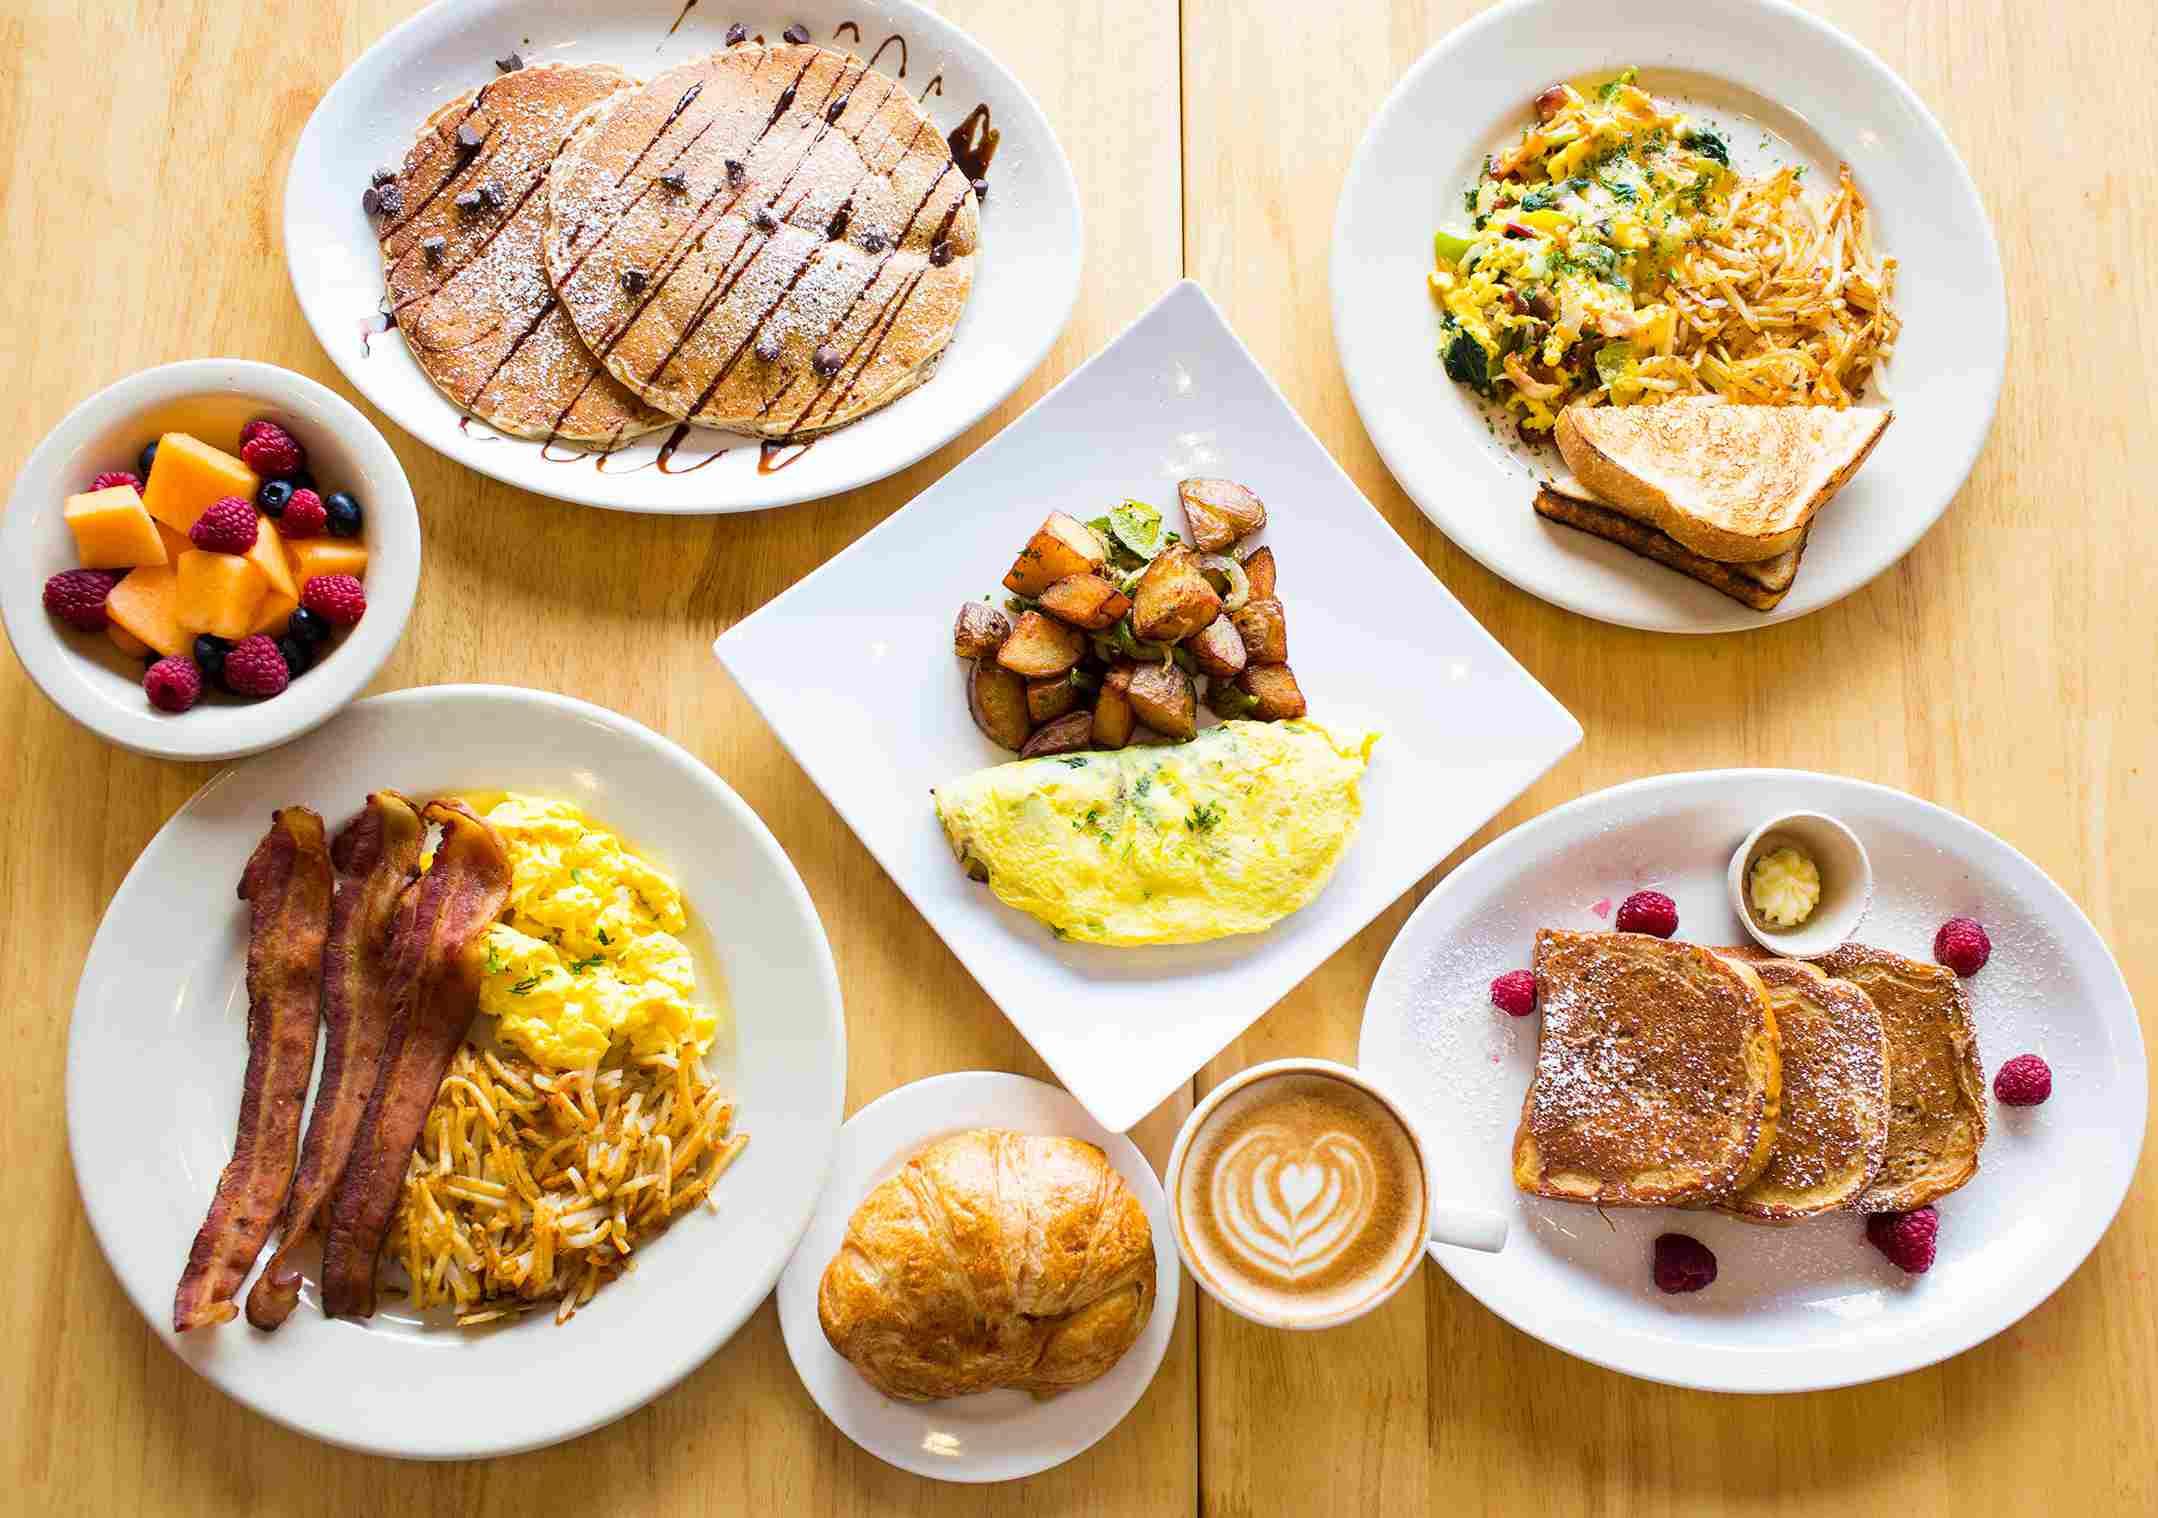 Homeskillet breakfast spread